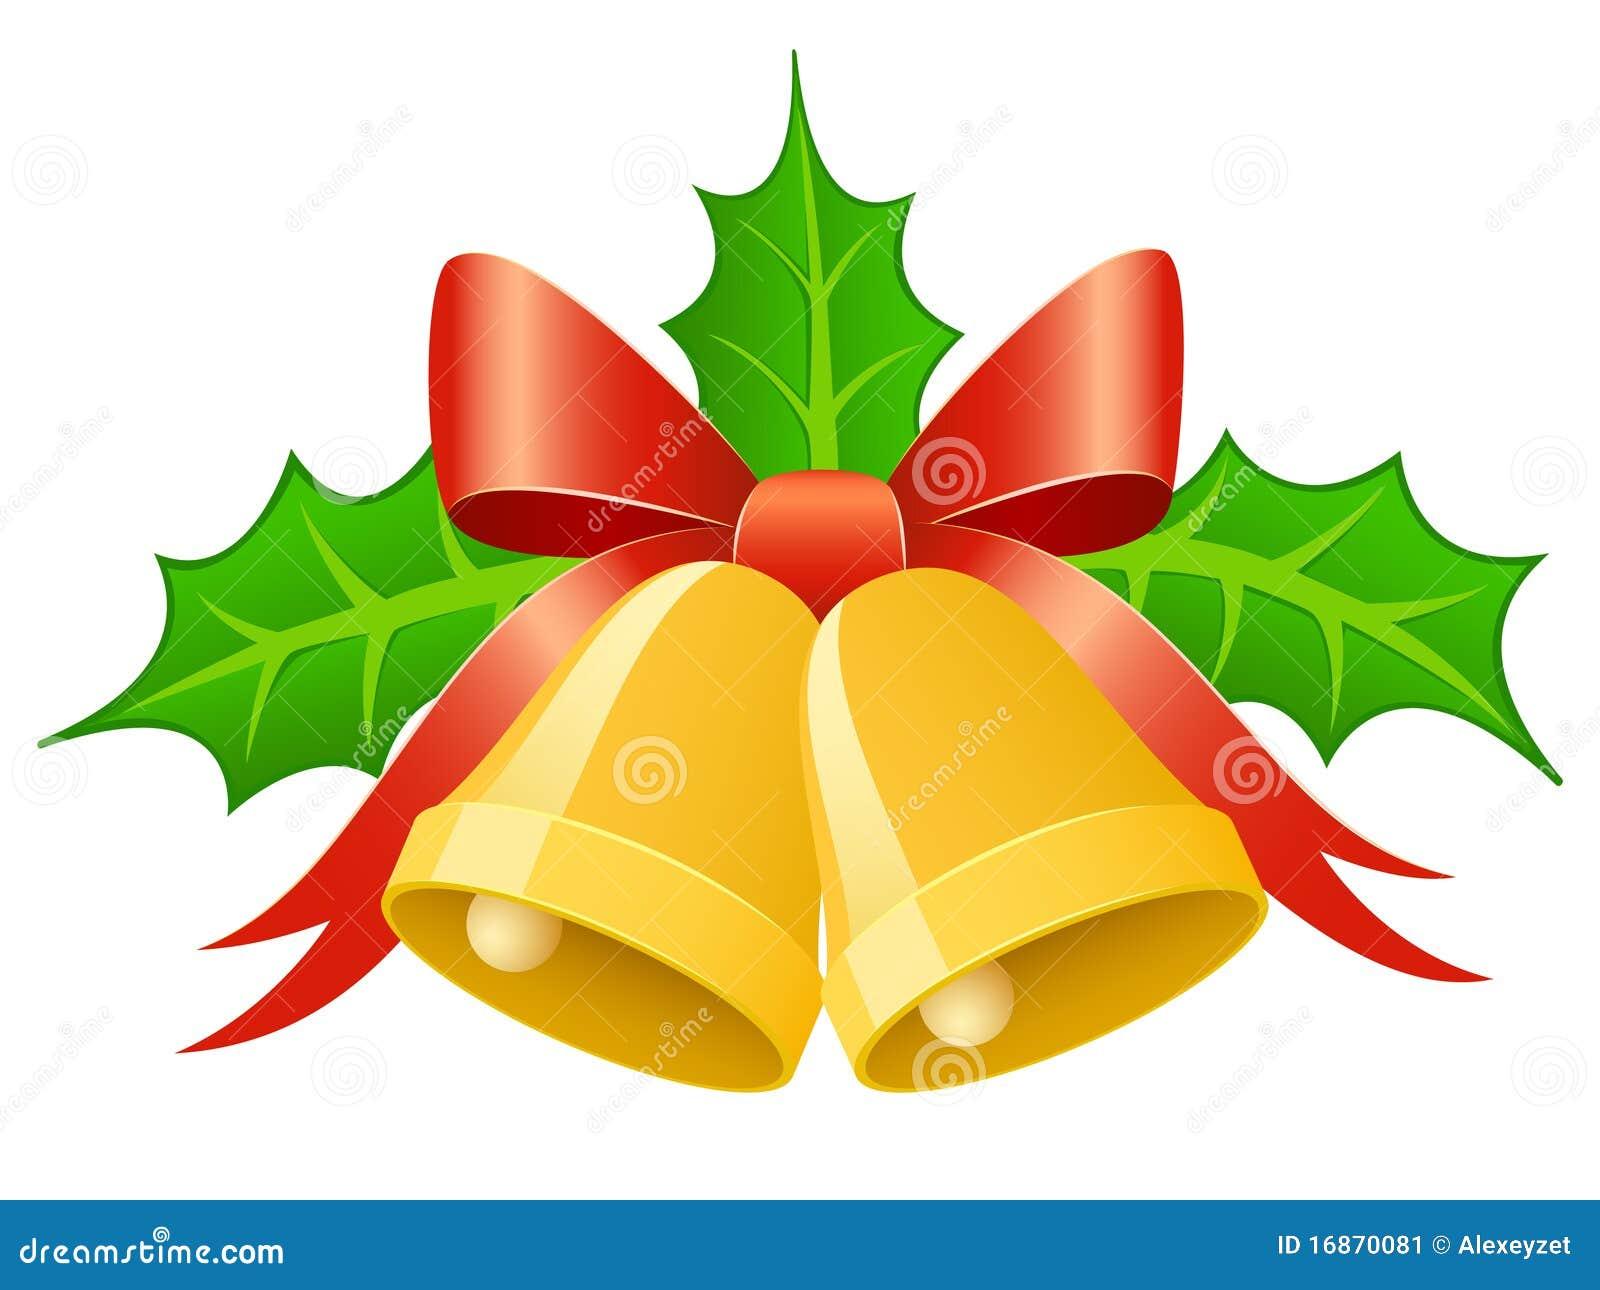 Christmas gold bells with ribbon bow and holly lea stock vector image 16870081 - Sobre de navidad para imprimir ...